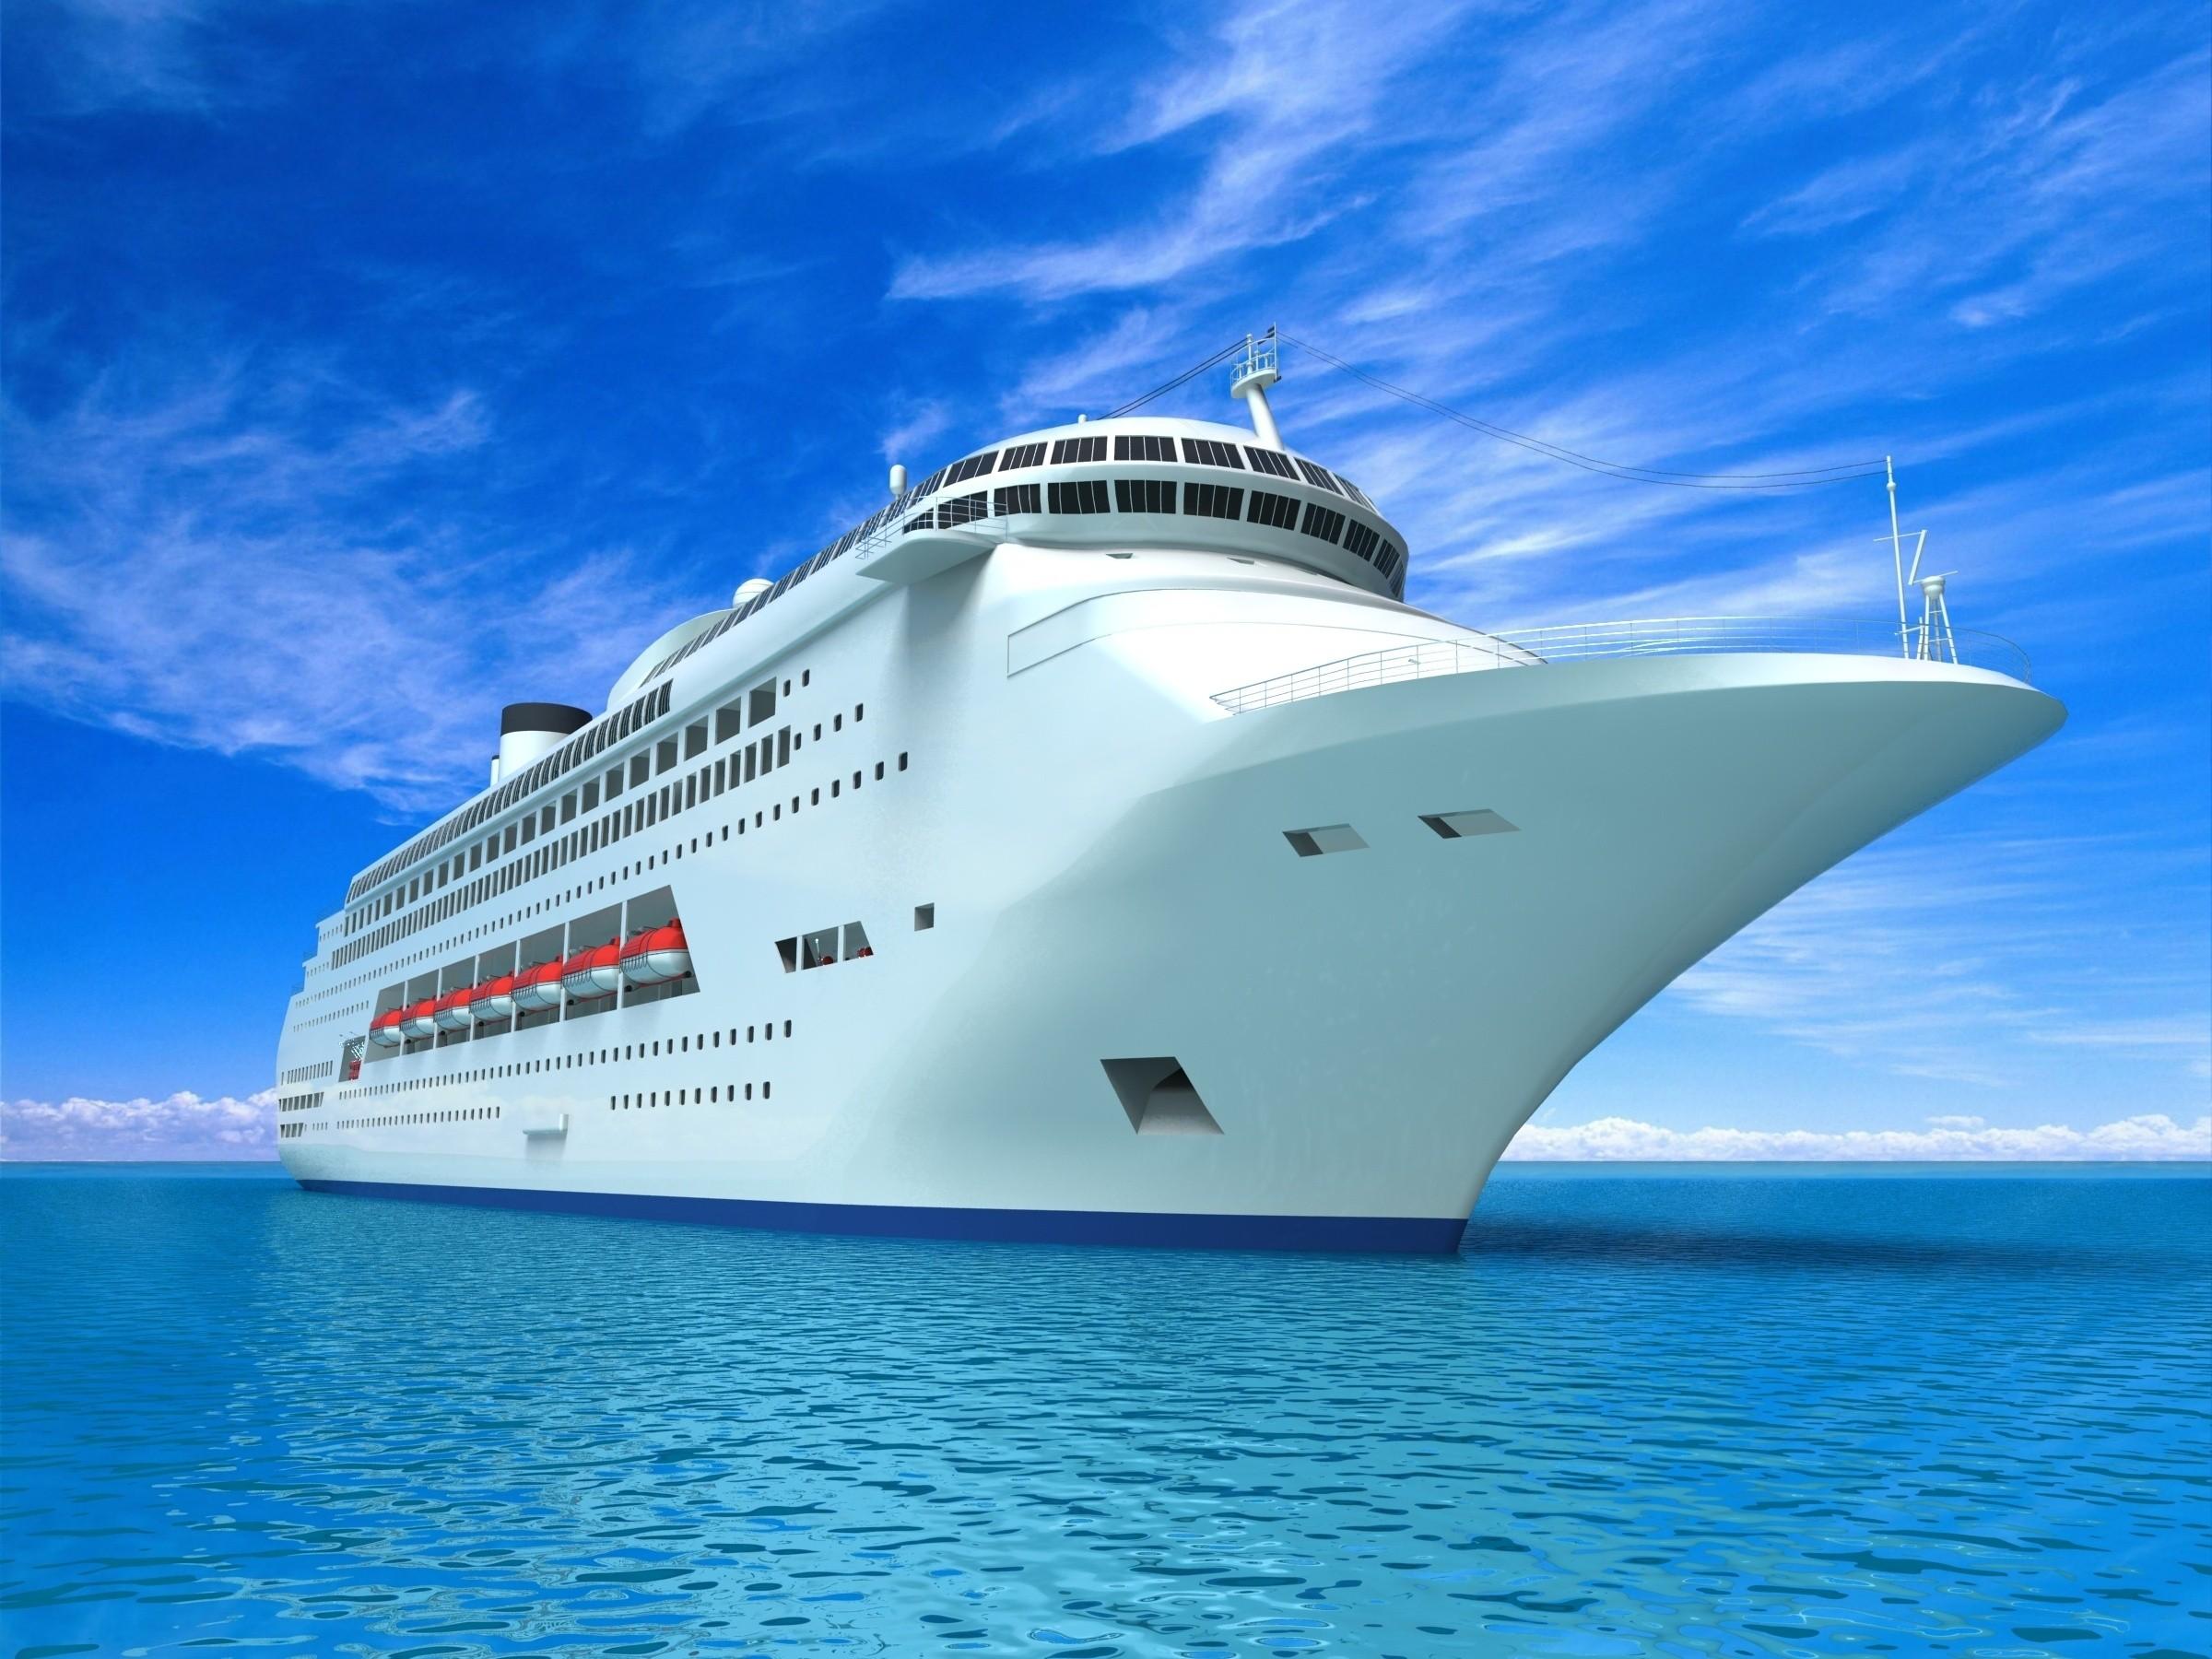 Wallpaper Boat Sea Vehicle Cruise Ship Vessel Caribbean Concept Watercraft Graphics Ecosystem Motor Ship Passenger Ship Luxury Yacht Ocean Liner 2400x1800 Wallup 584294 Hd Wallpapers Wallhere